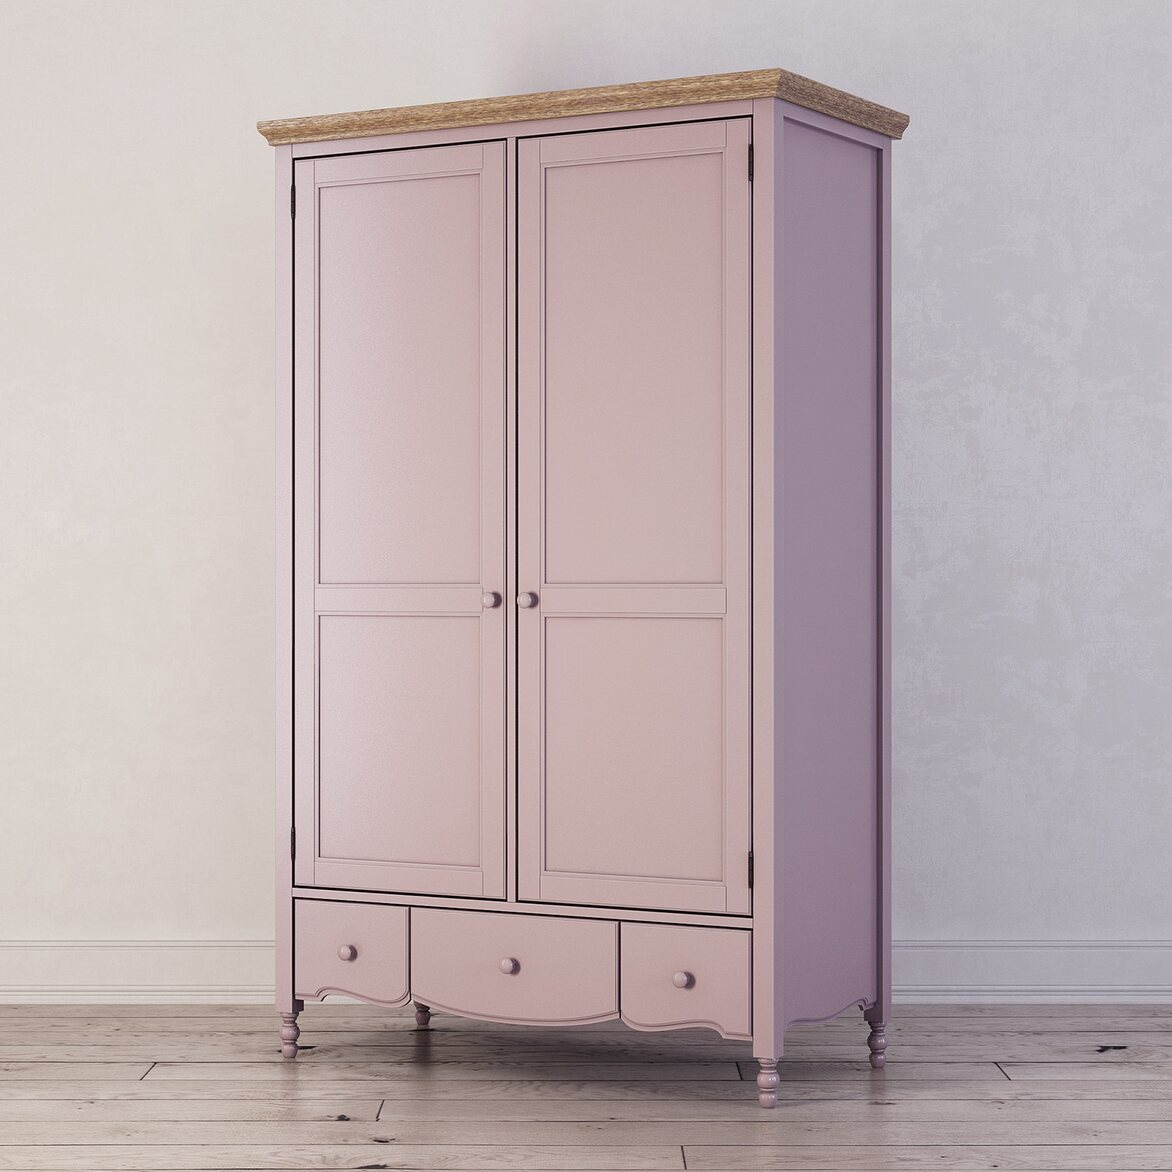 Шкаф двухстворчатый Leblanc, лаванда 2   Платяные шкафы Kingsby